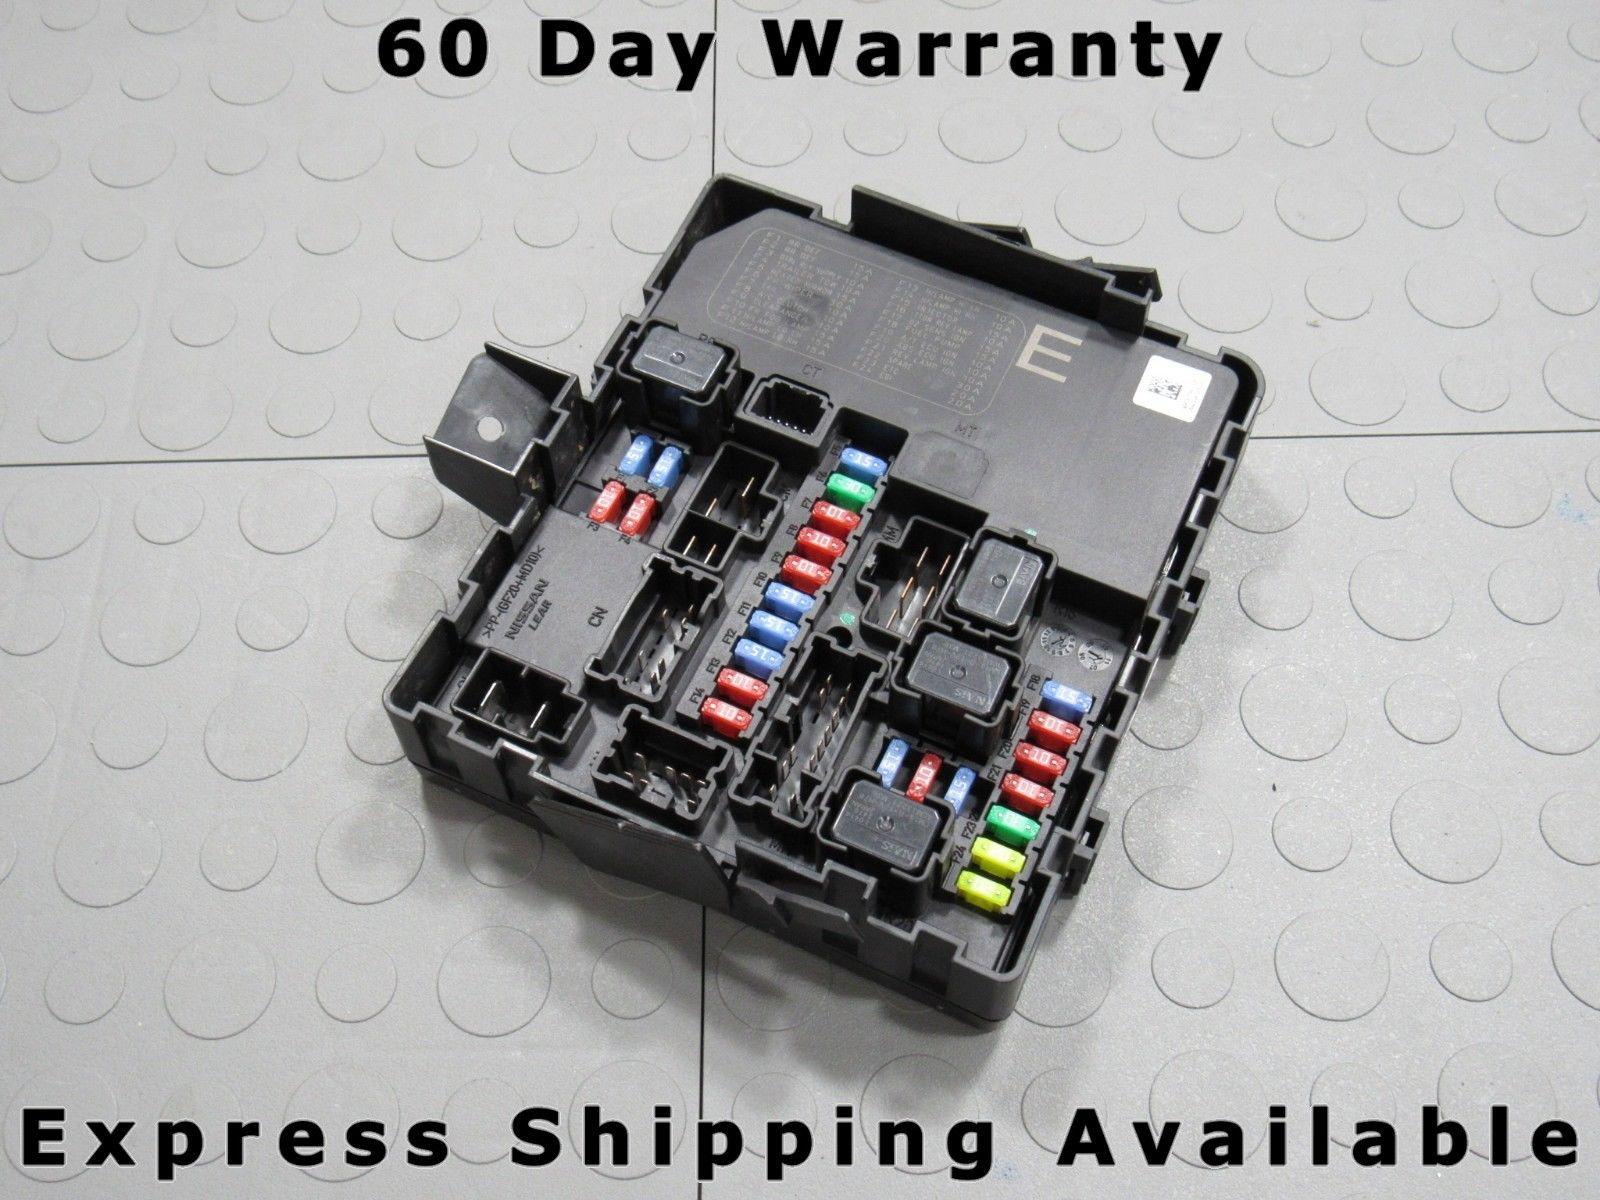 Fuse Box For Infiniti Qx56 Electrical Wiring Diagrams G20 Fuses Circuit And Diagram Hub U2022